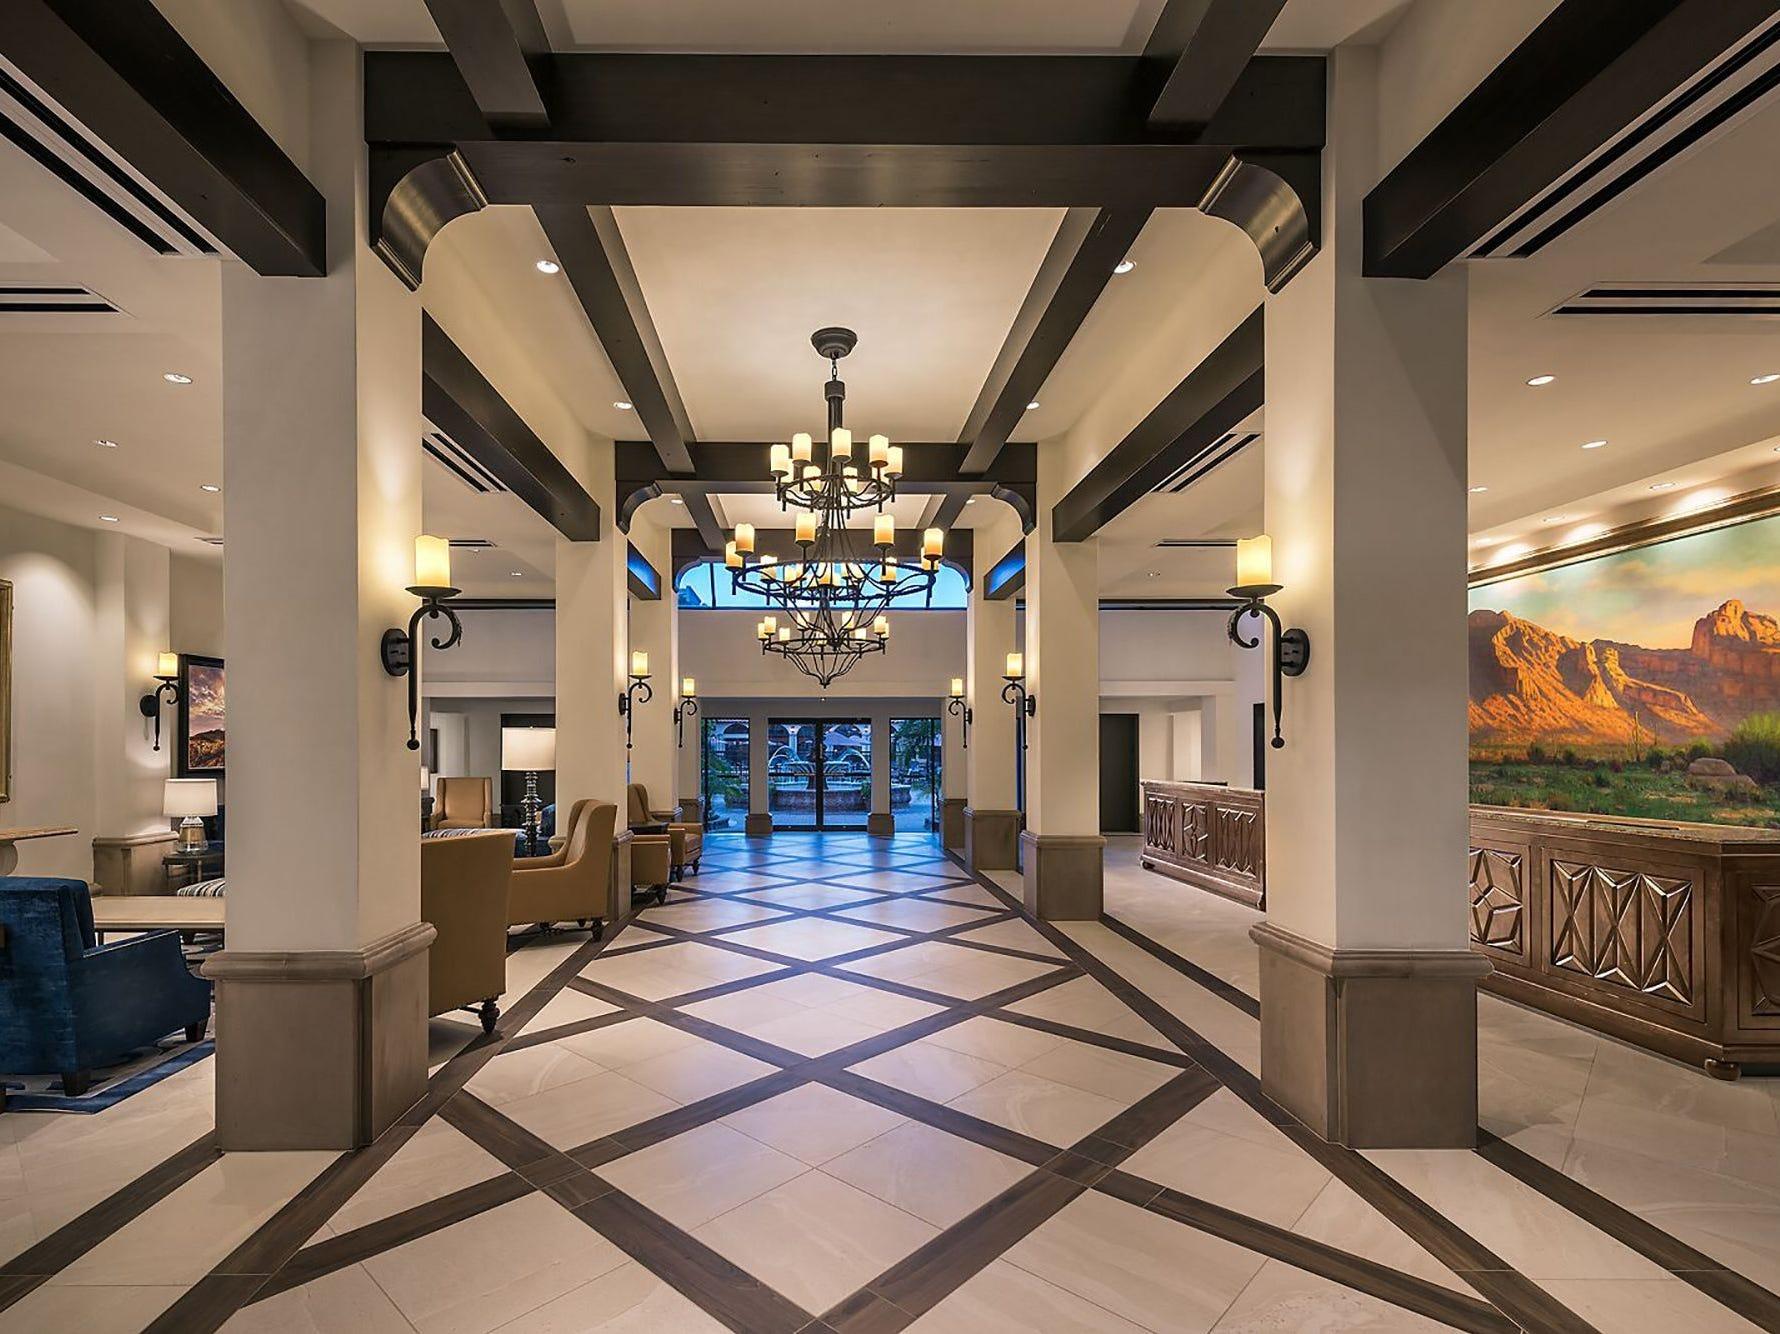 No. 52 (tie): Hilton Worldwide Holdings Inc. | Hotels, resorts, timeshares | 2019 employees: 3,400 | 2018 employees: 3,400 | Ownership: Public | Headquarters: McLean, Virginia | www.hilton.com